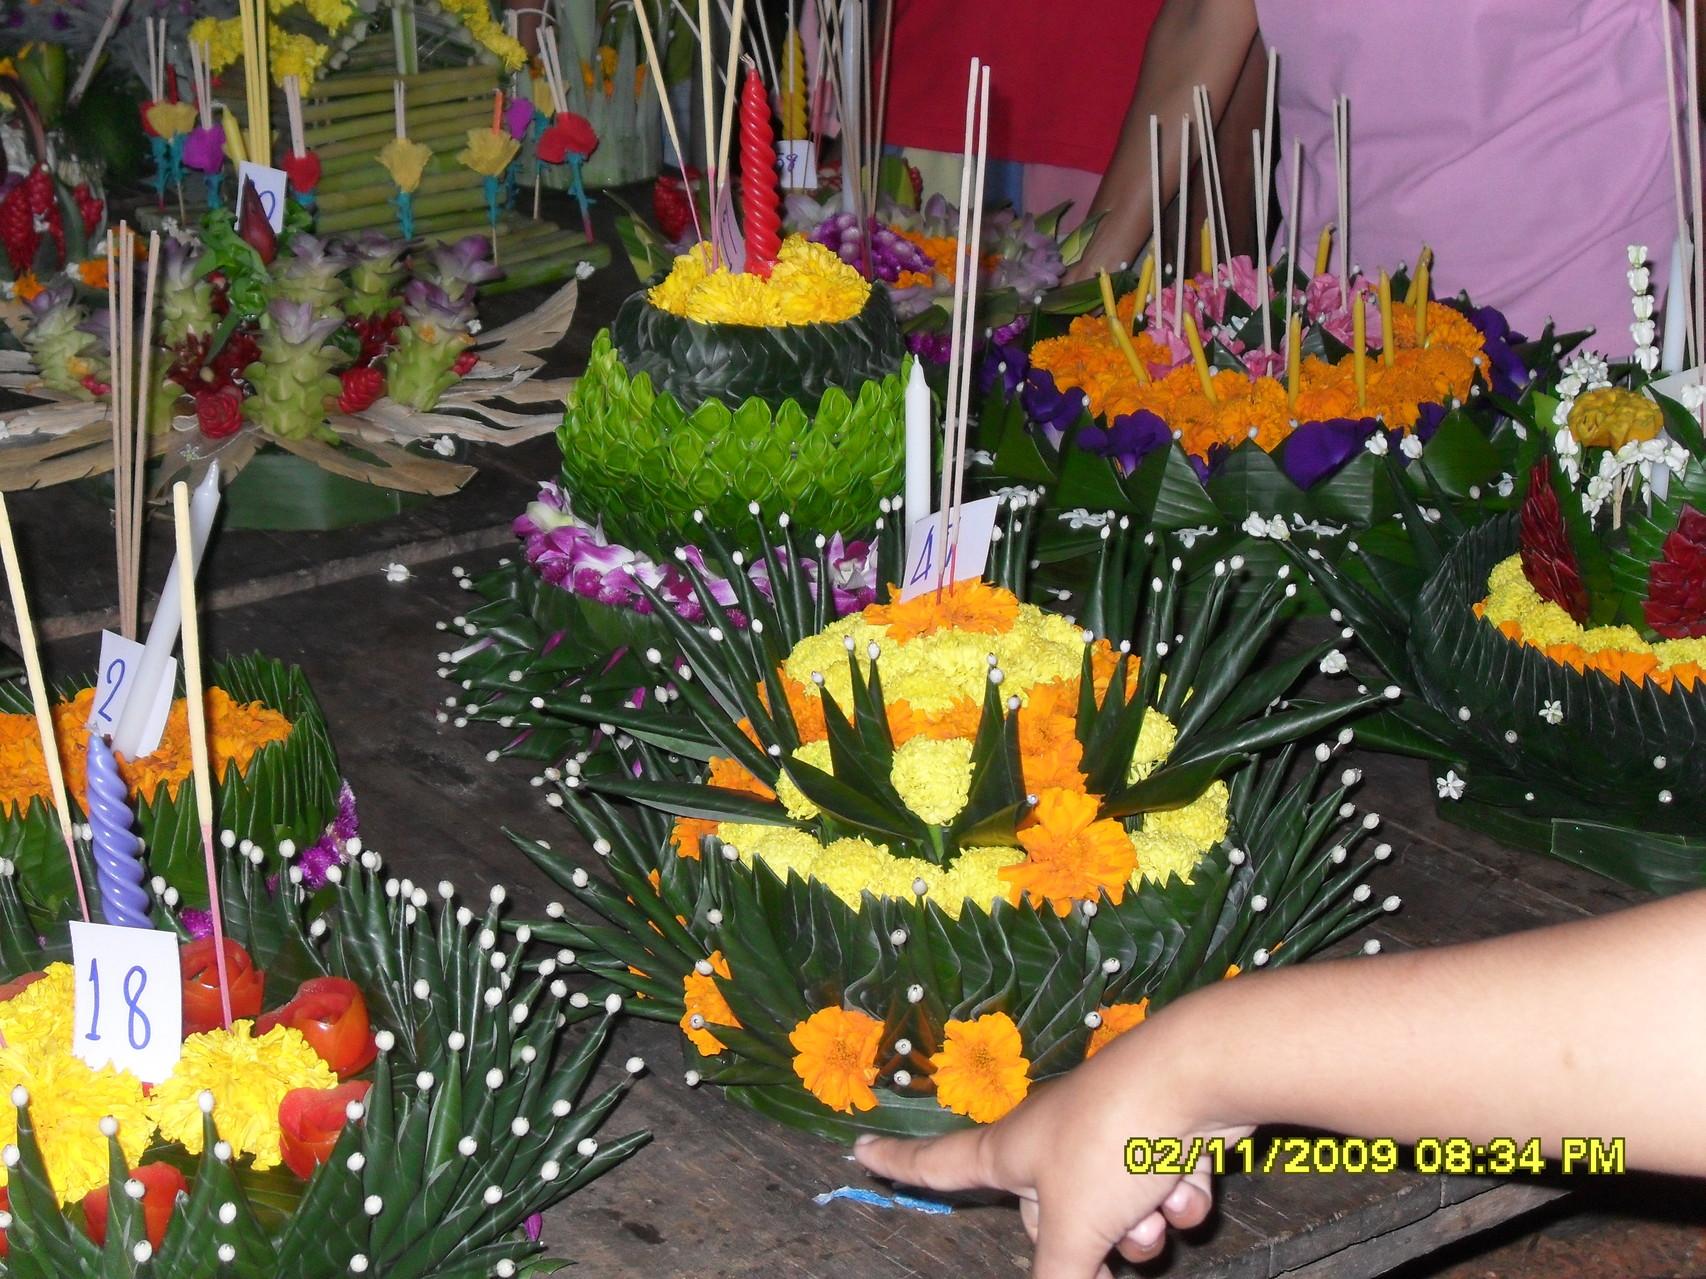 Selber gemachte Glücksbringer zum Loi Kratong Festival